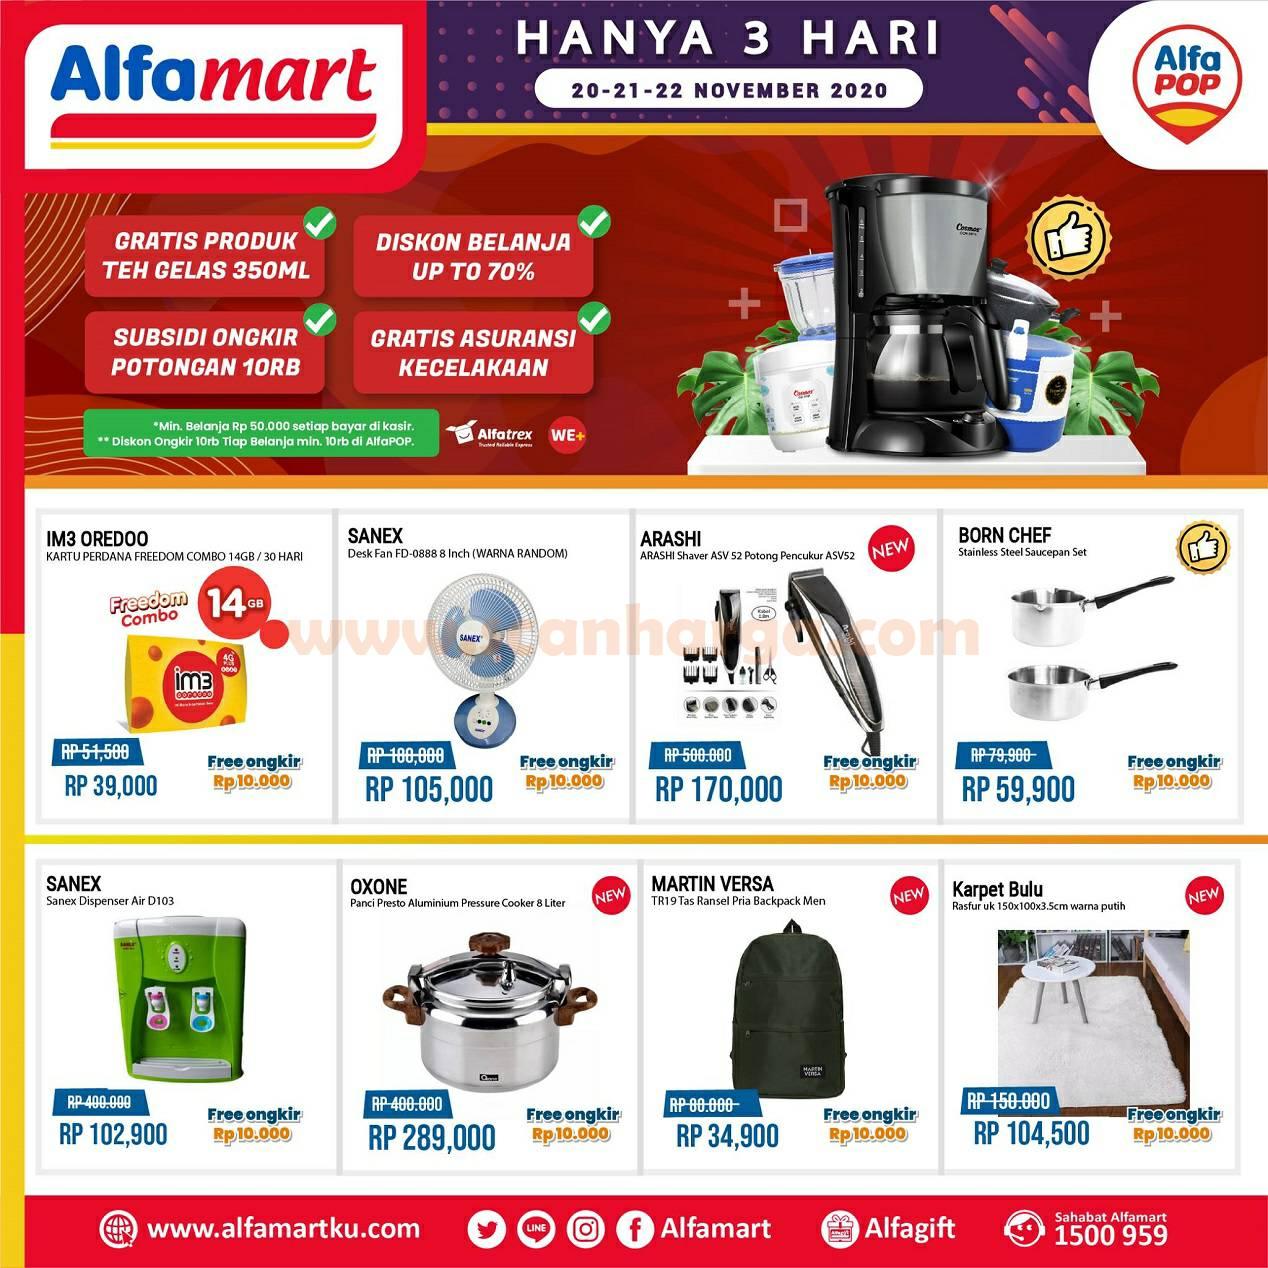 Alfamart Promo Jsm Alfapop 3 Hari: 20 - 22 November 2020